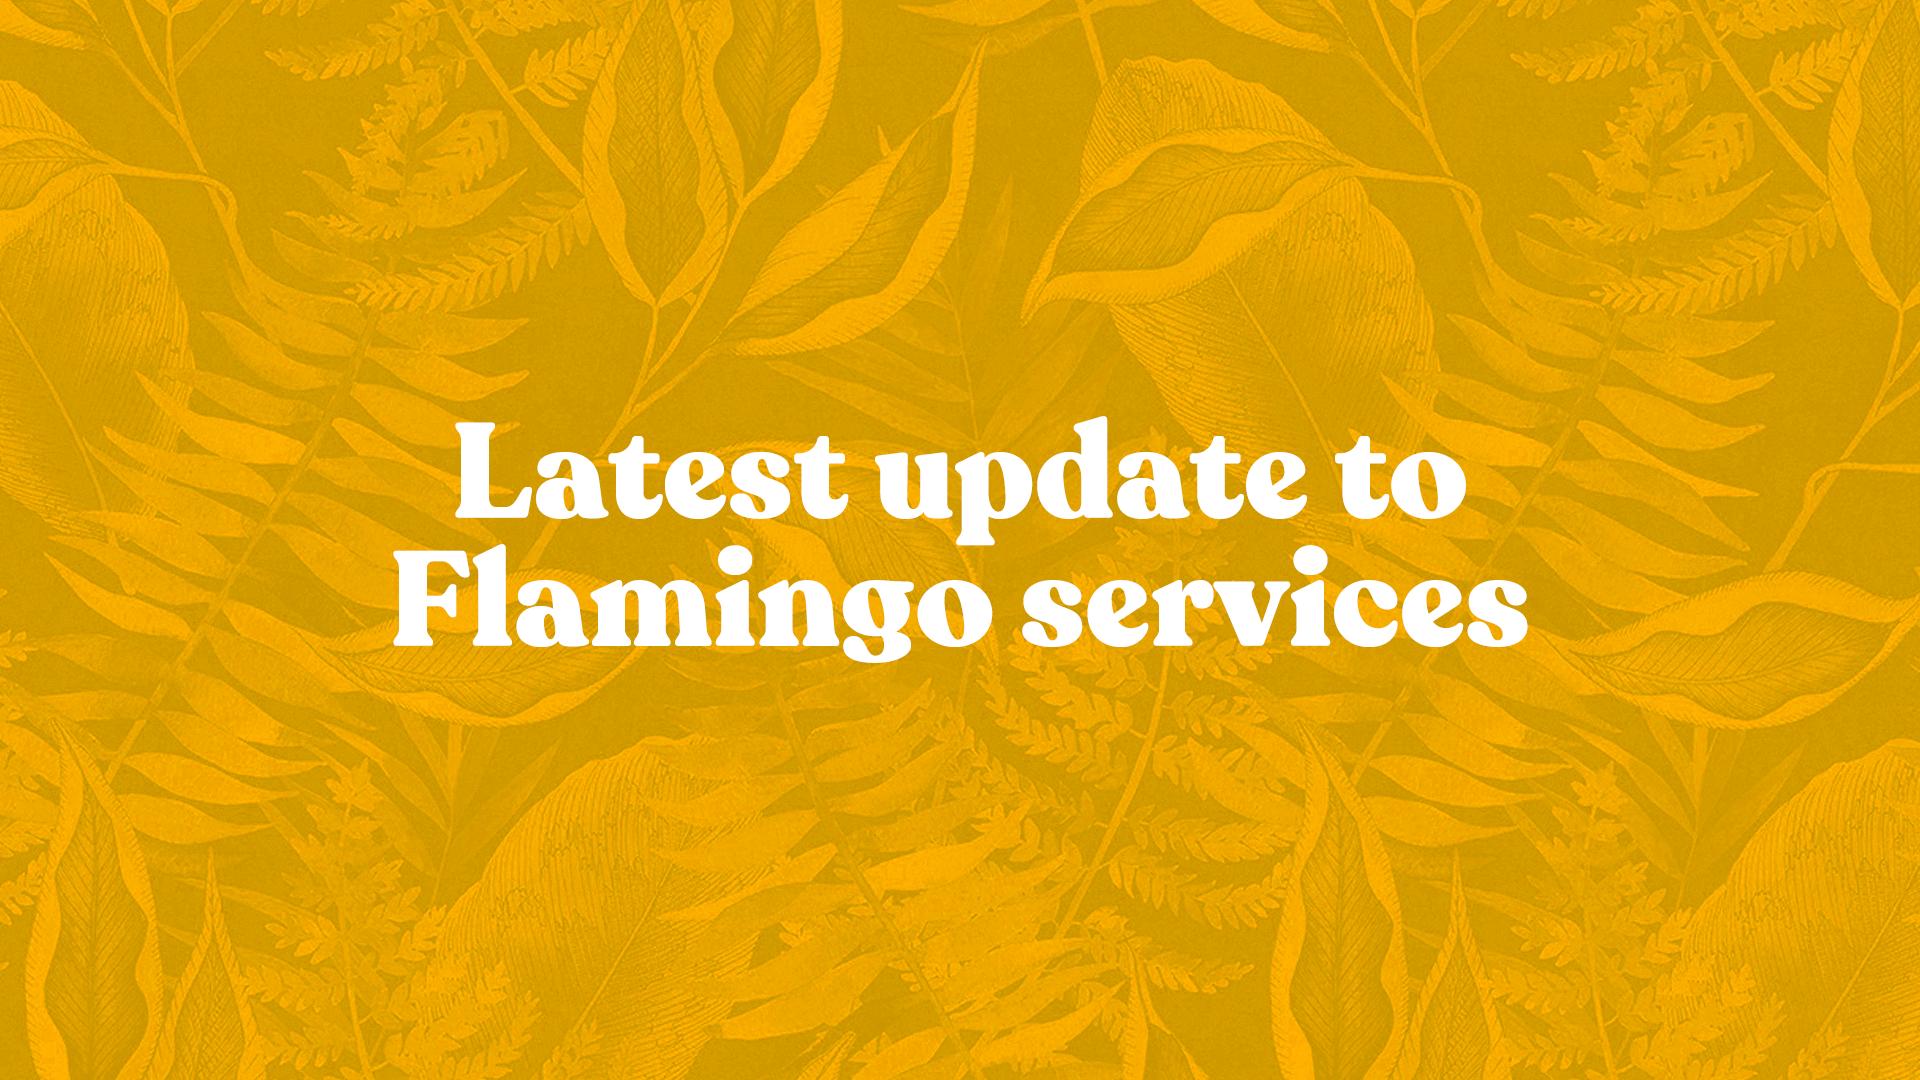 Flamingo Cafes: Latest update to Flamingo services